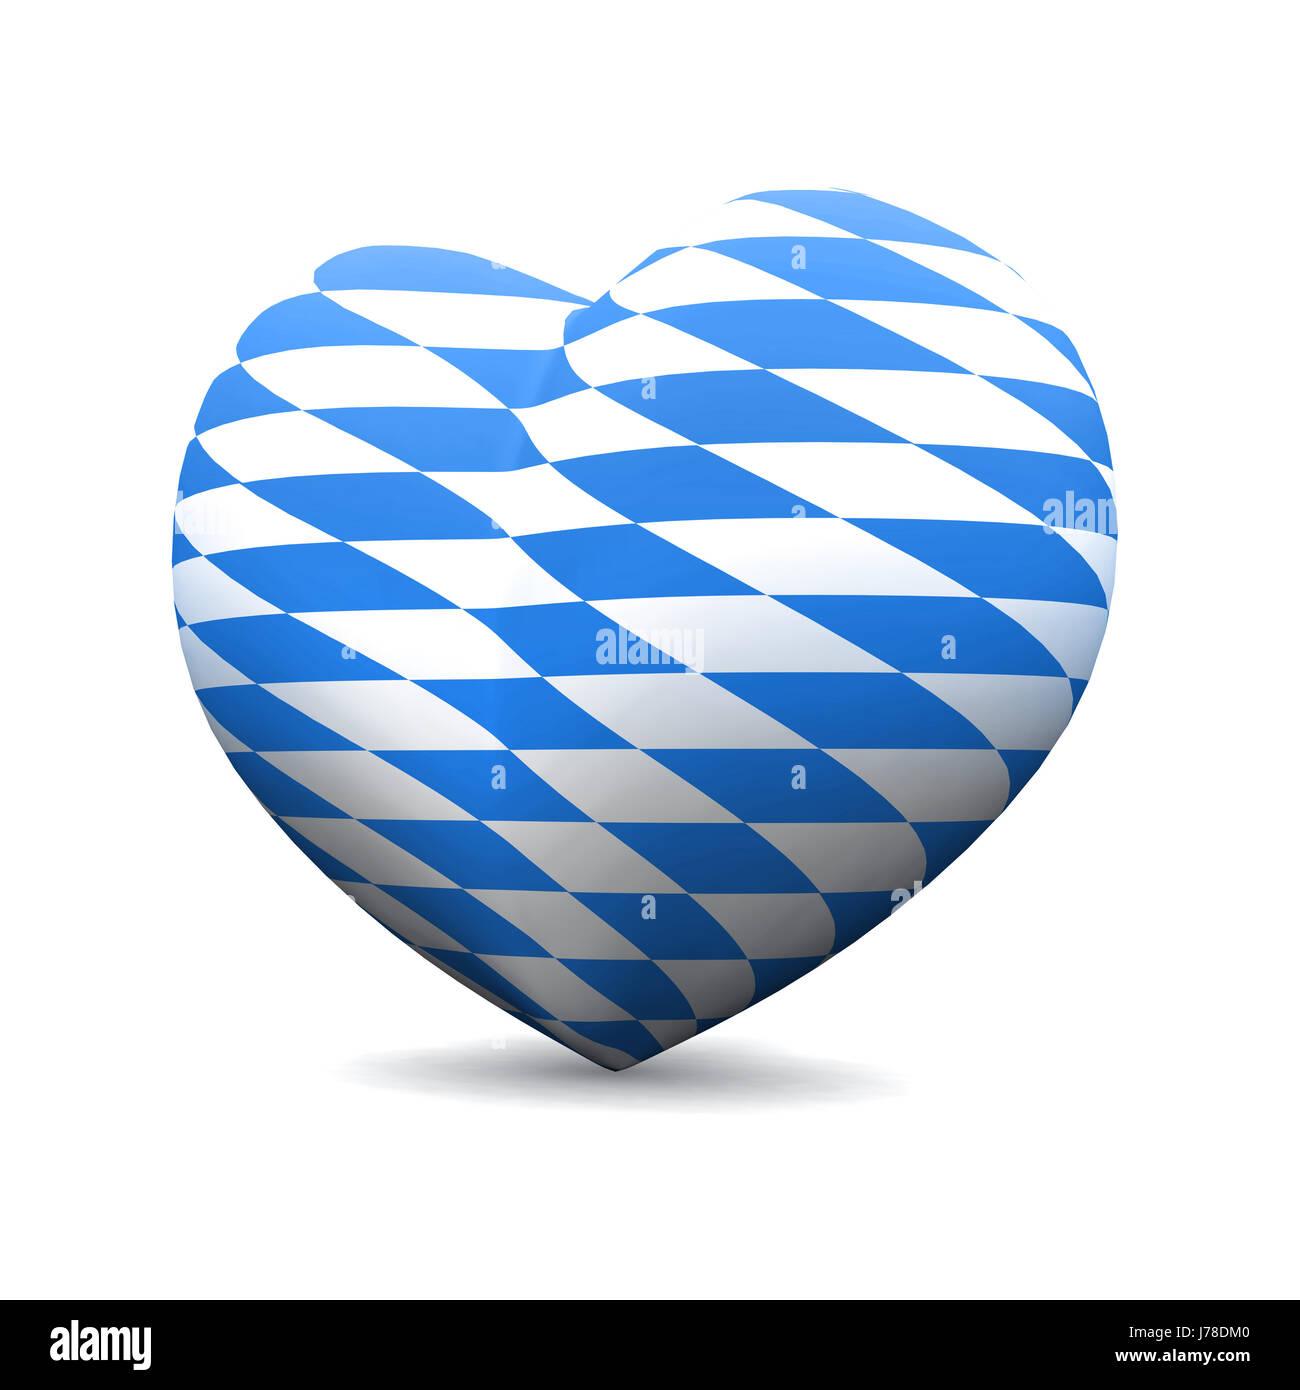 3d heart - we love bavaria - Stock Image